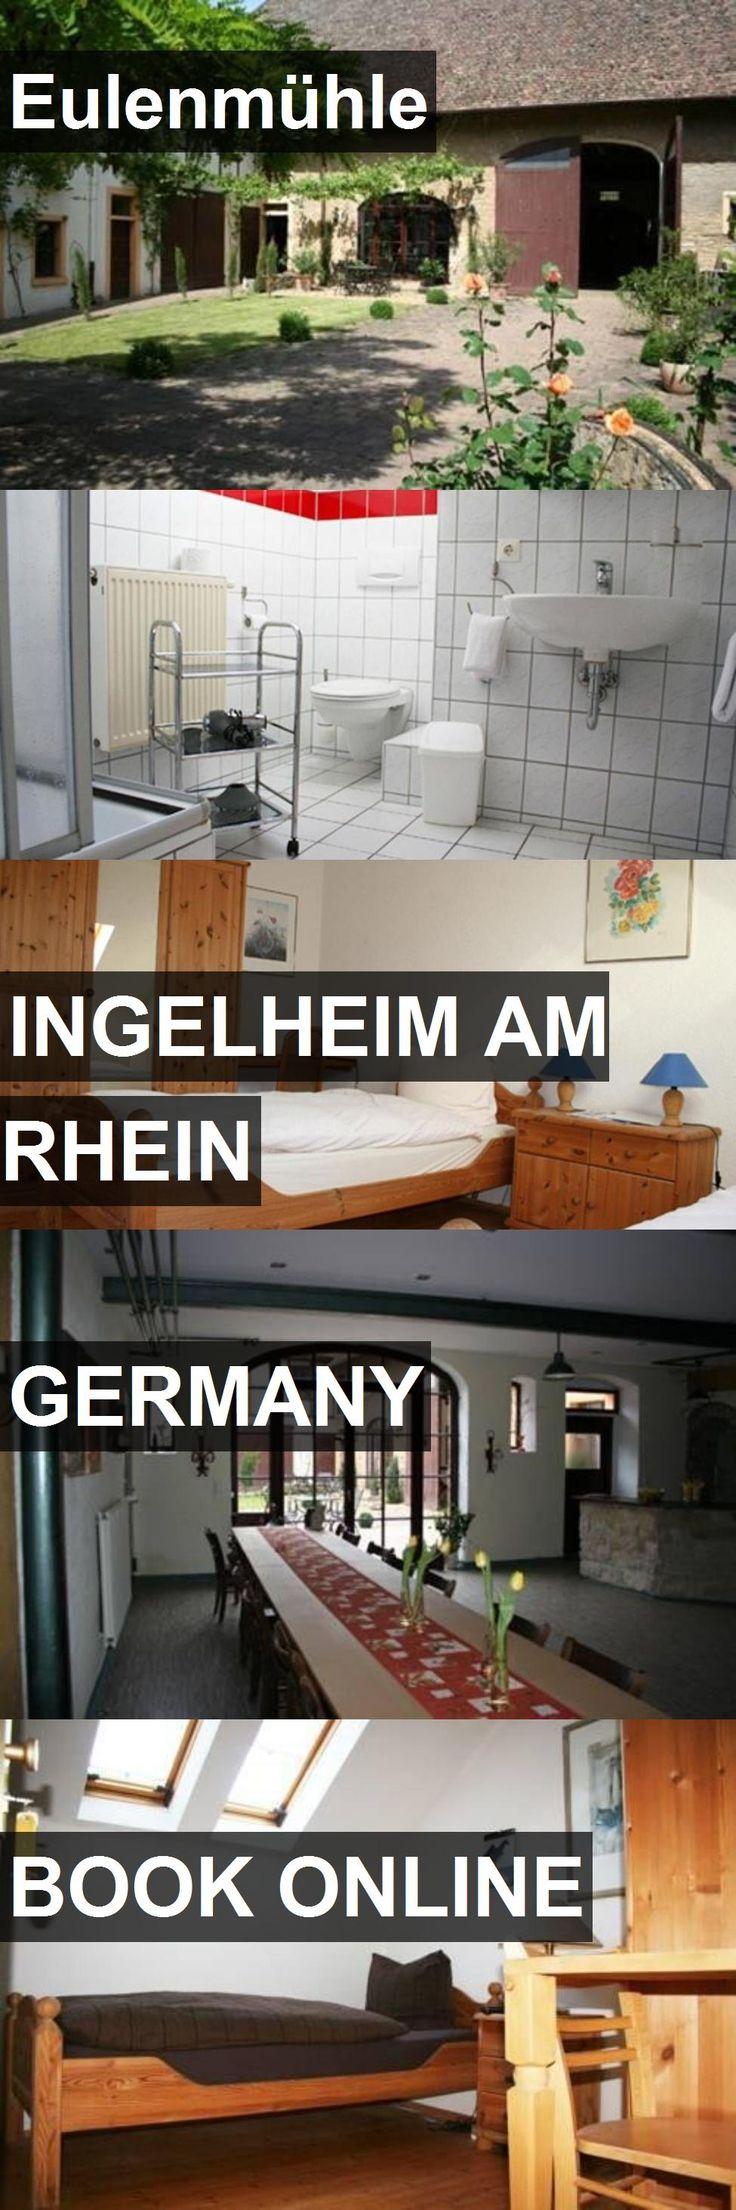 Hotel Eulenmühle in Ingelheim am Rhein, Germany. For more information, photos, reviews and best prices please follow the link. #Germany #IngelheimamRhein #travel #vacation #hotel